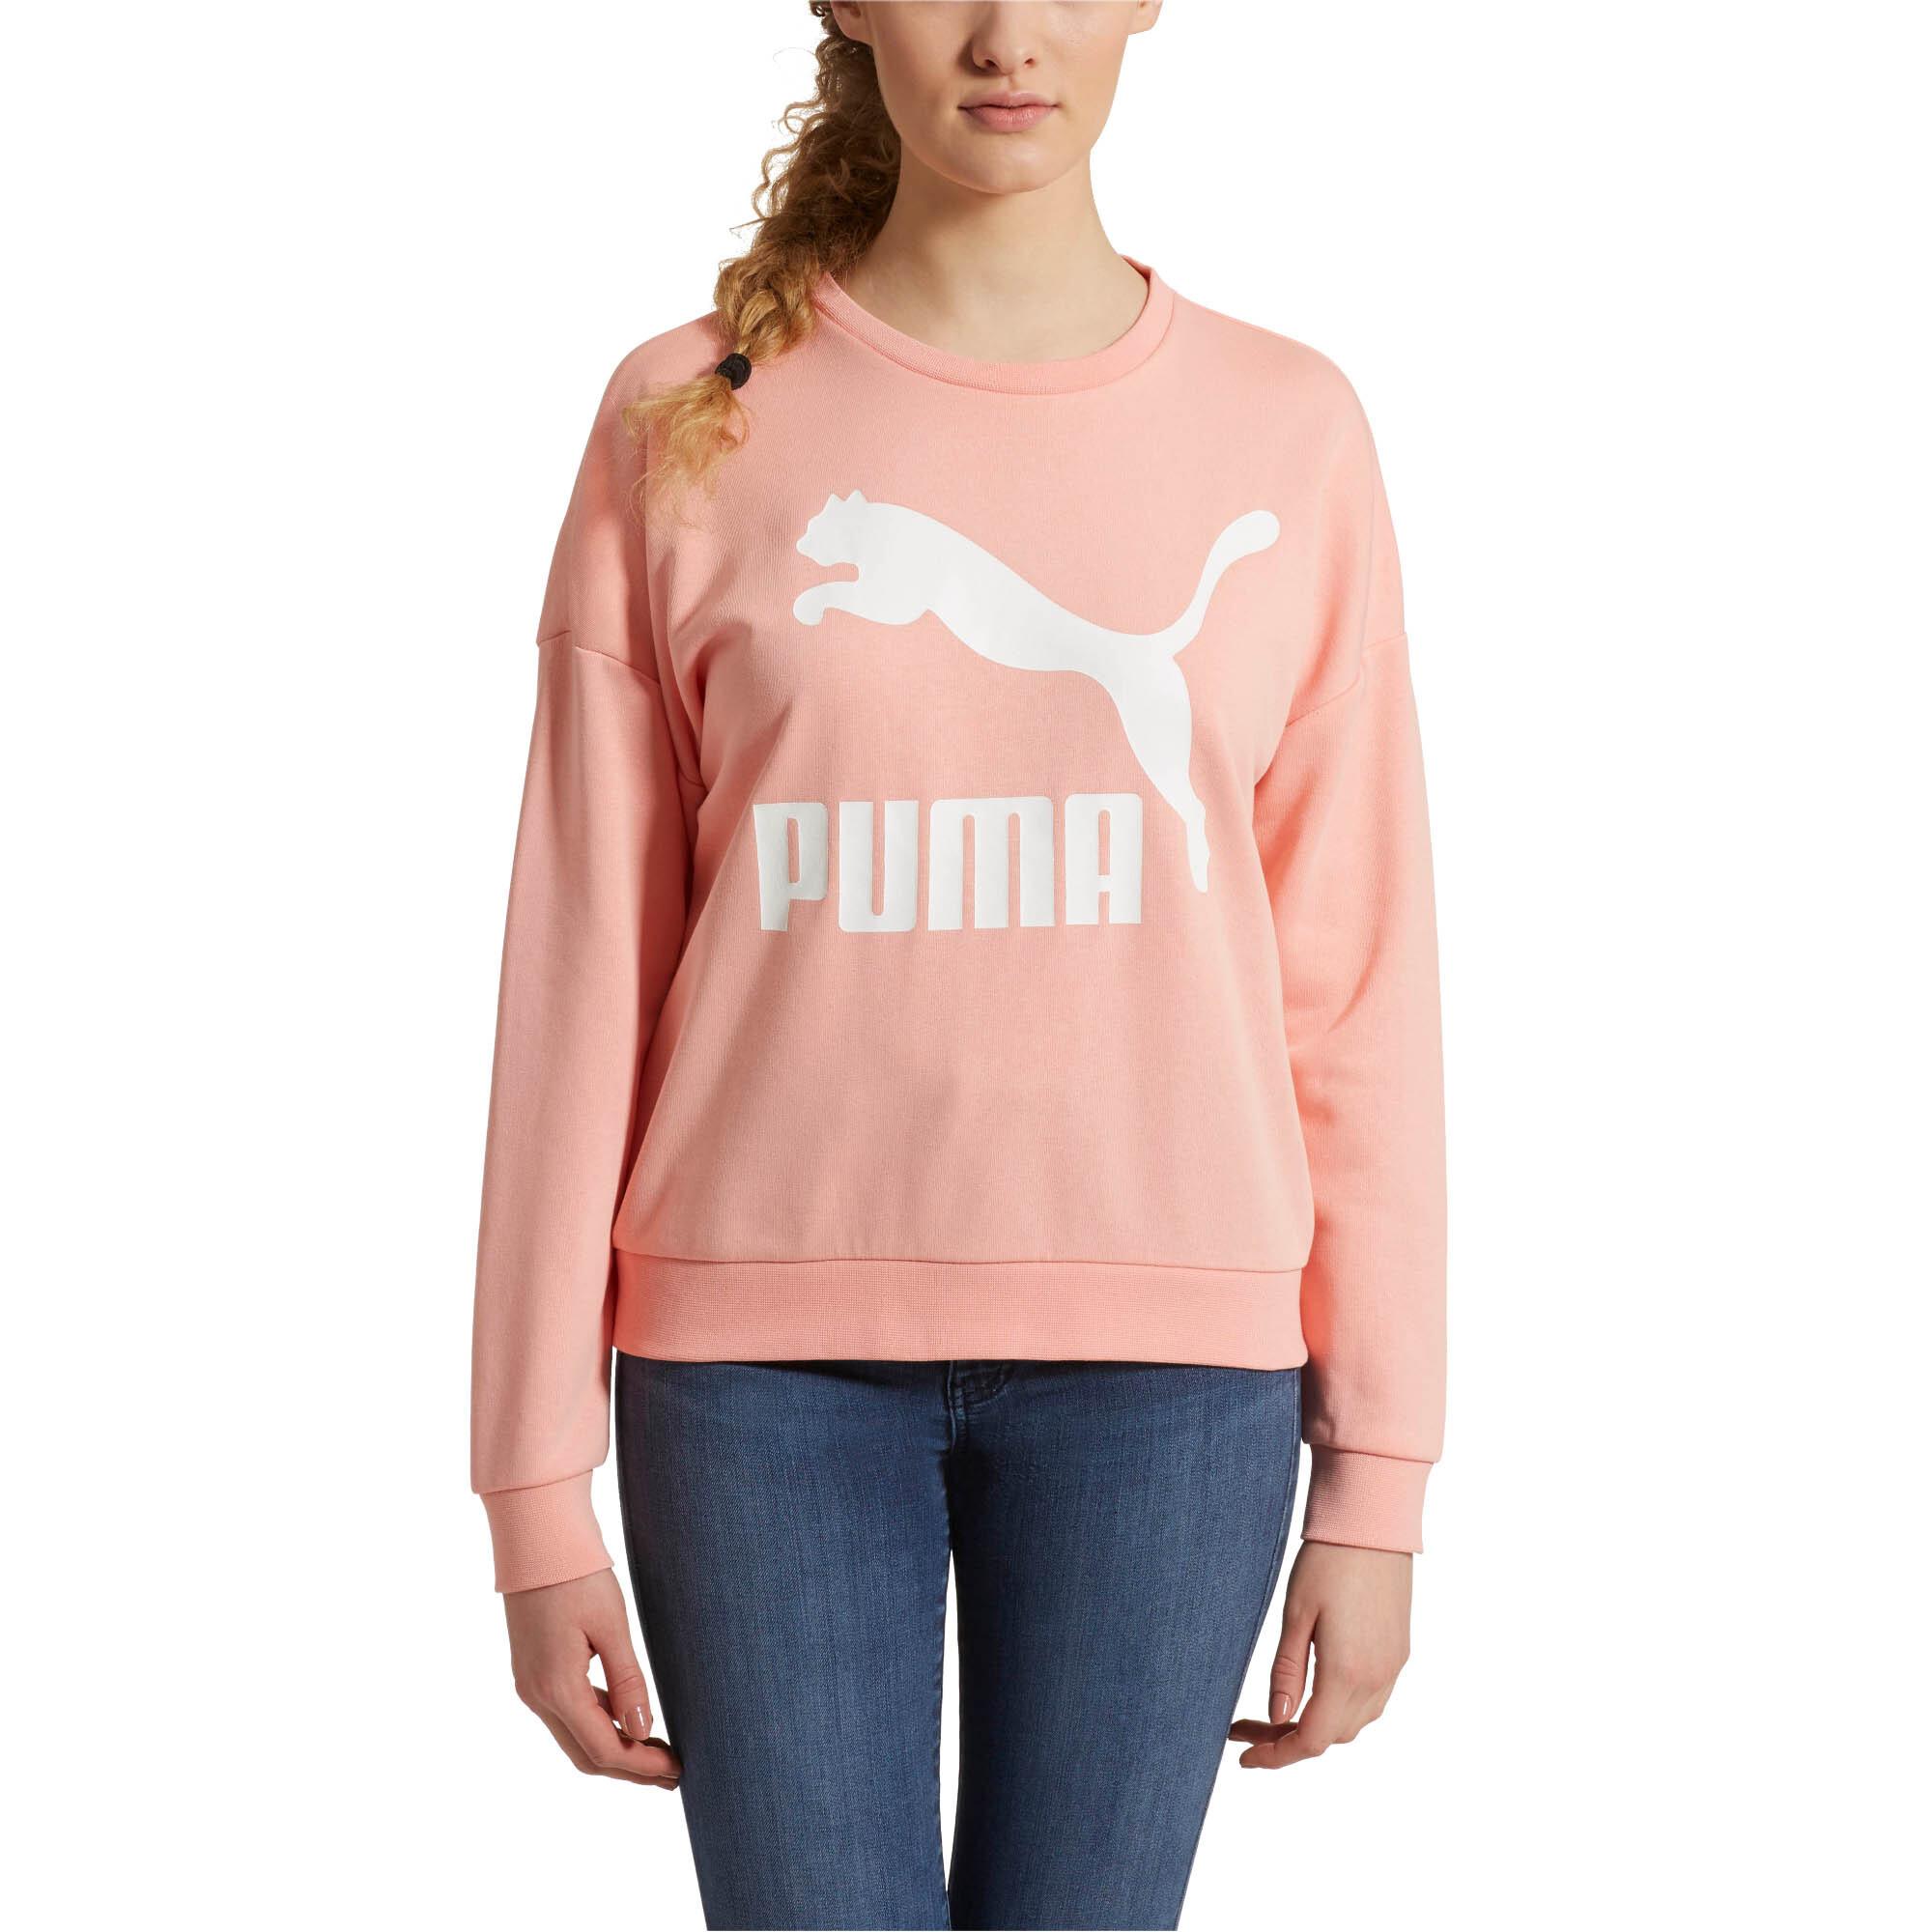 Image Puma Classics Logo Women's Crewneck Sweatshirt #1